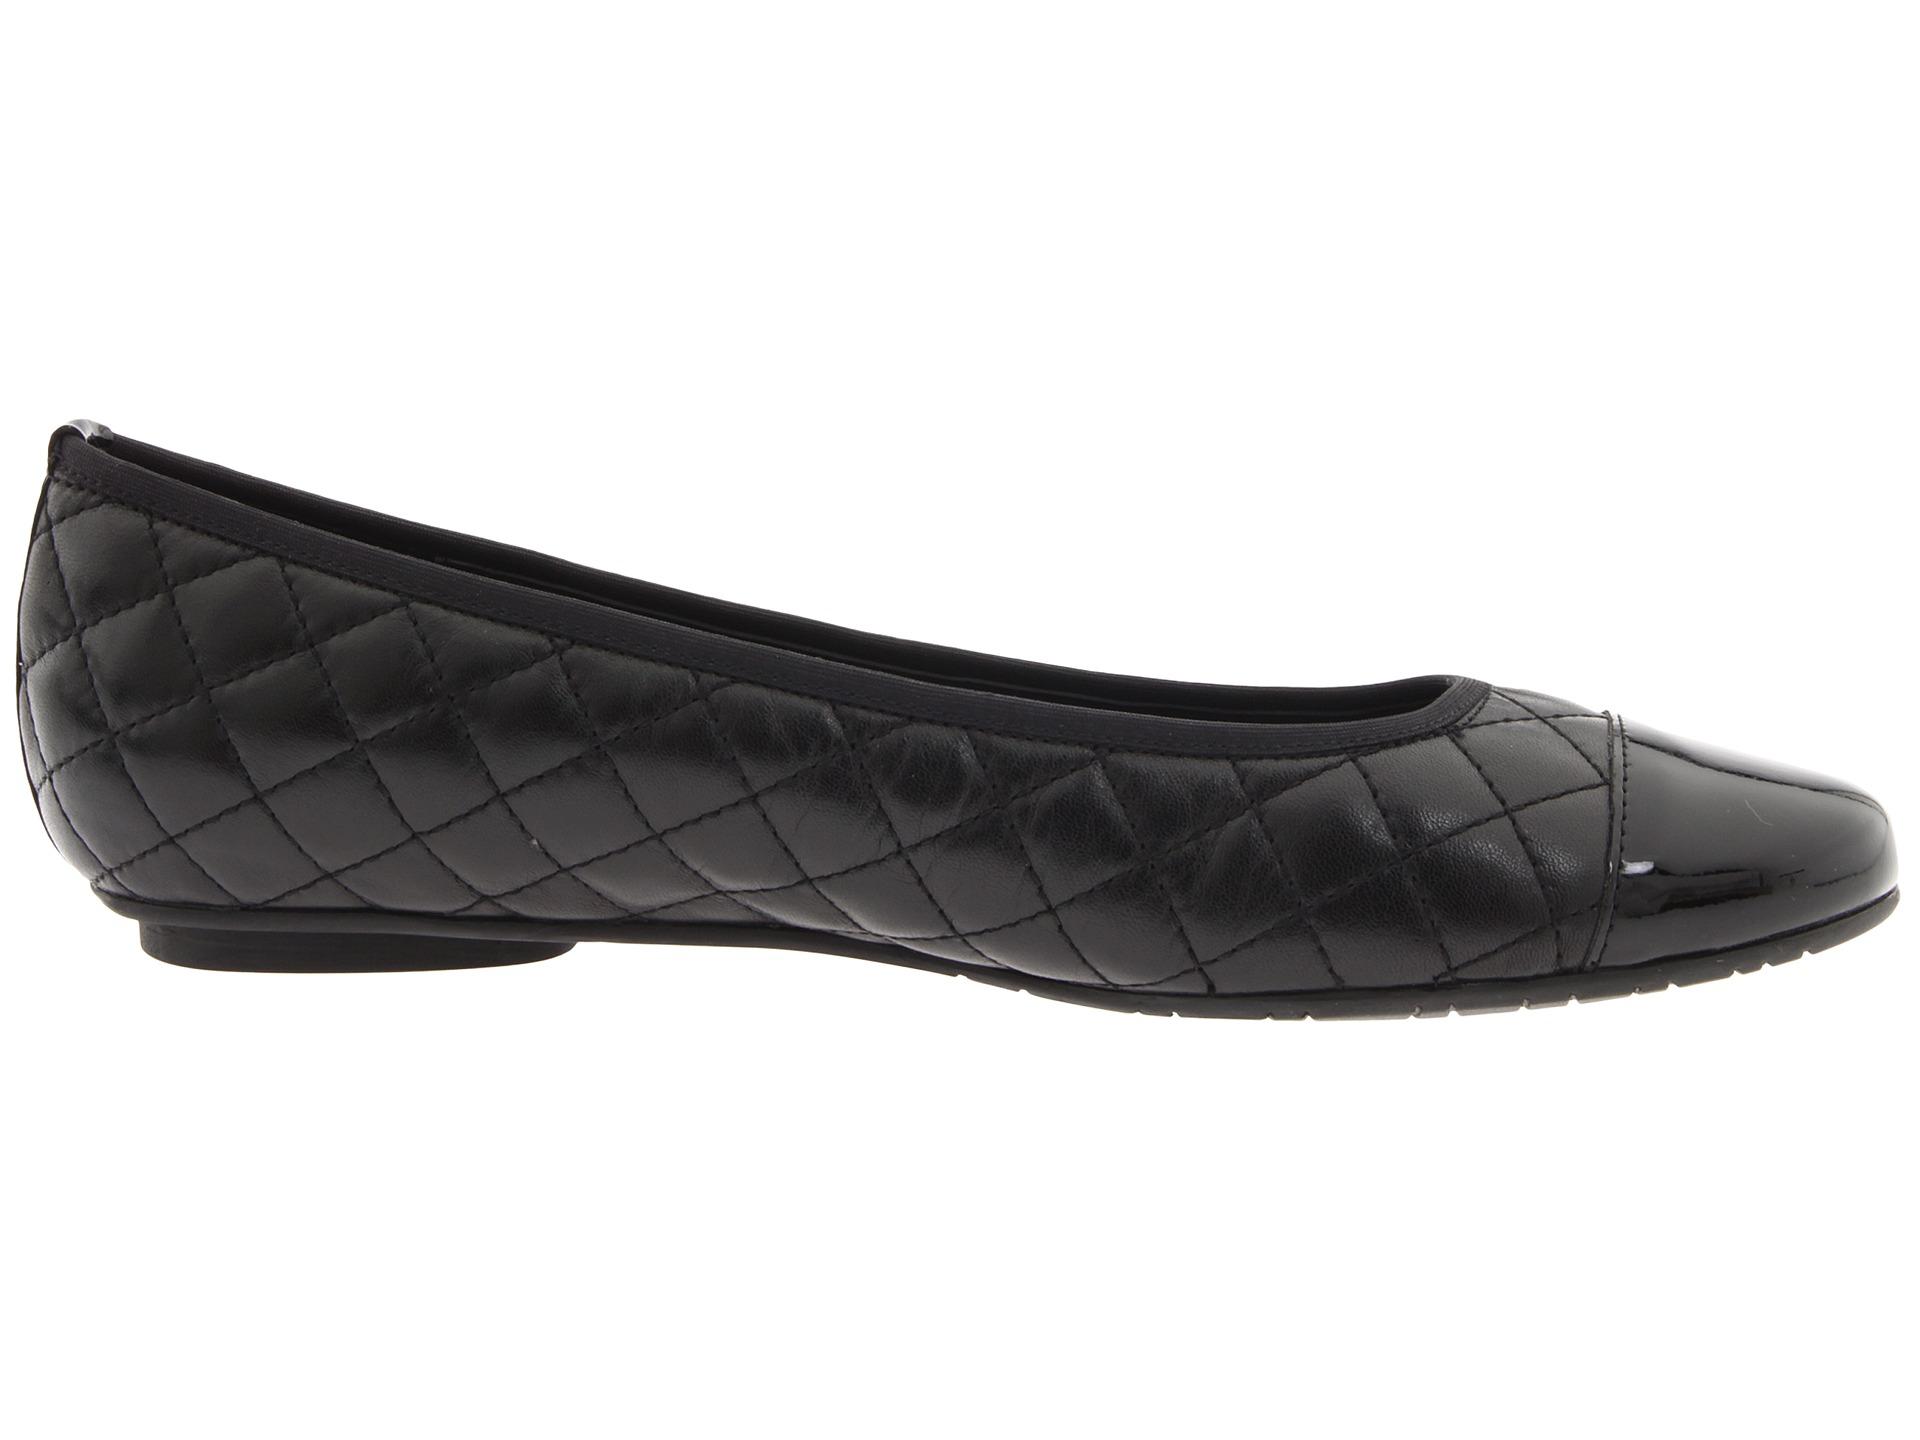 Serena Shoes - Reviews | Facebook